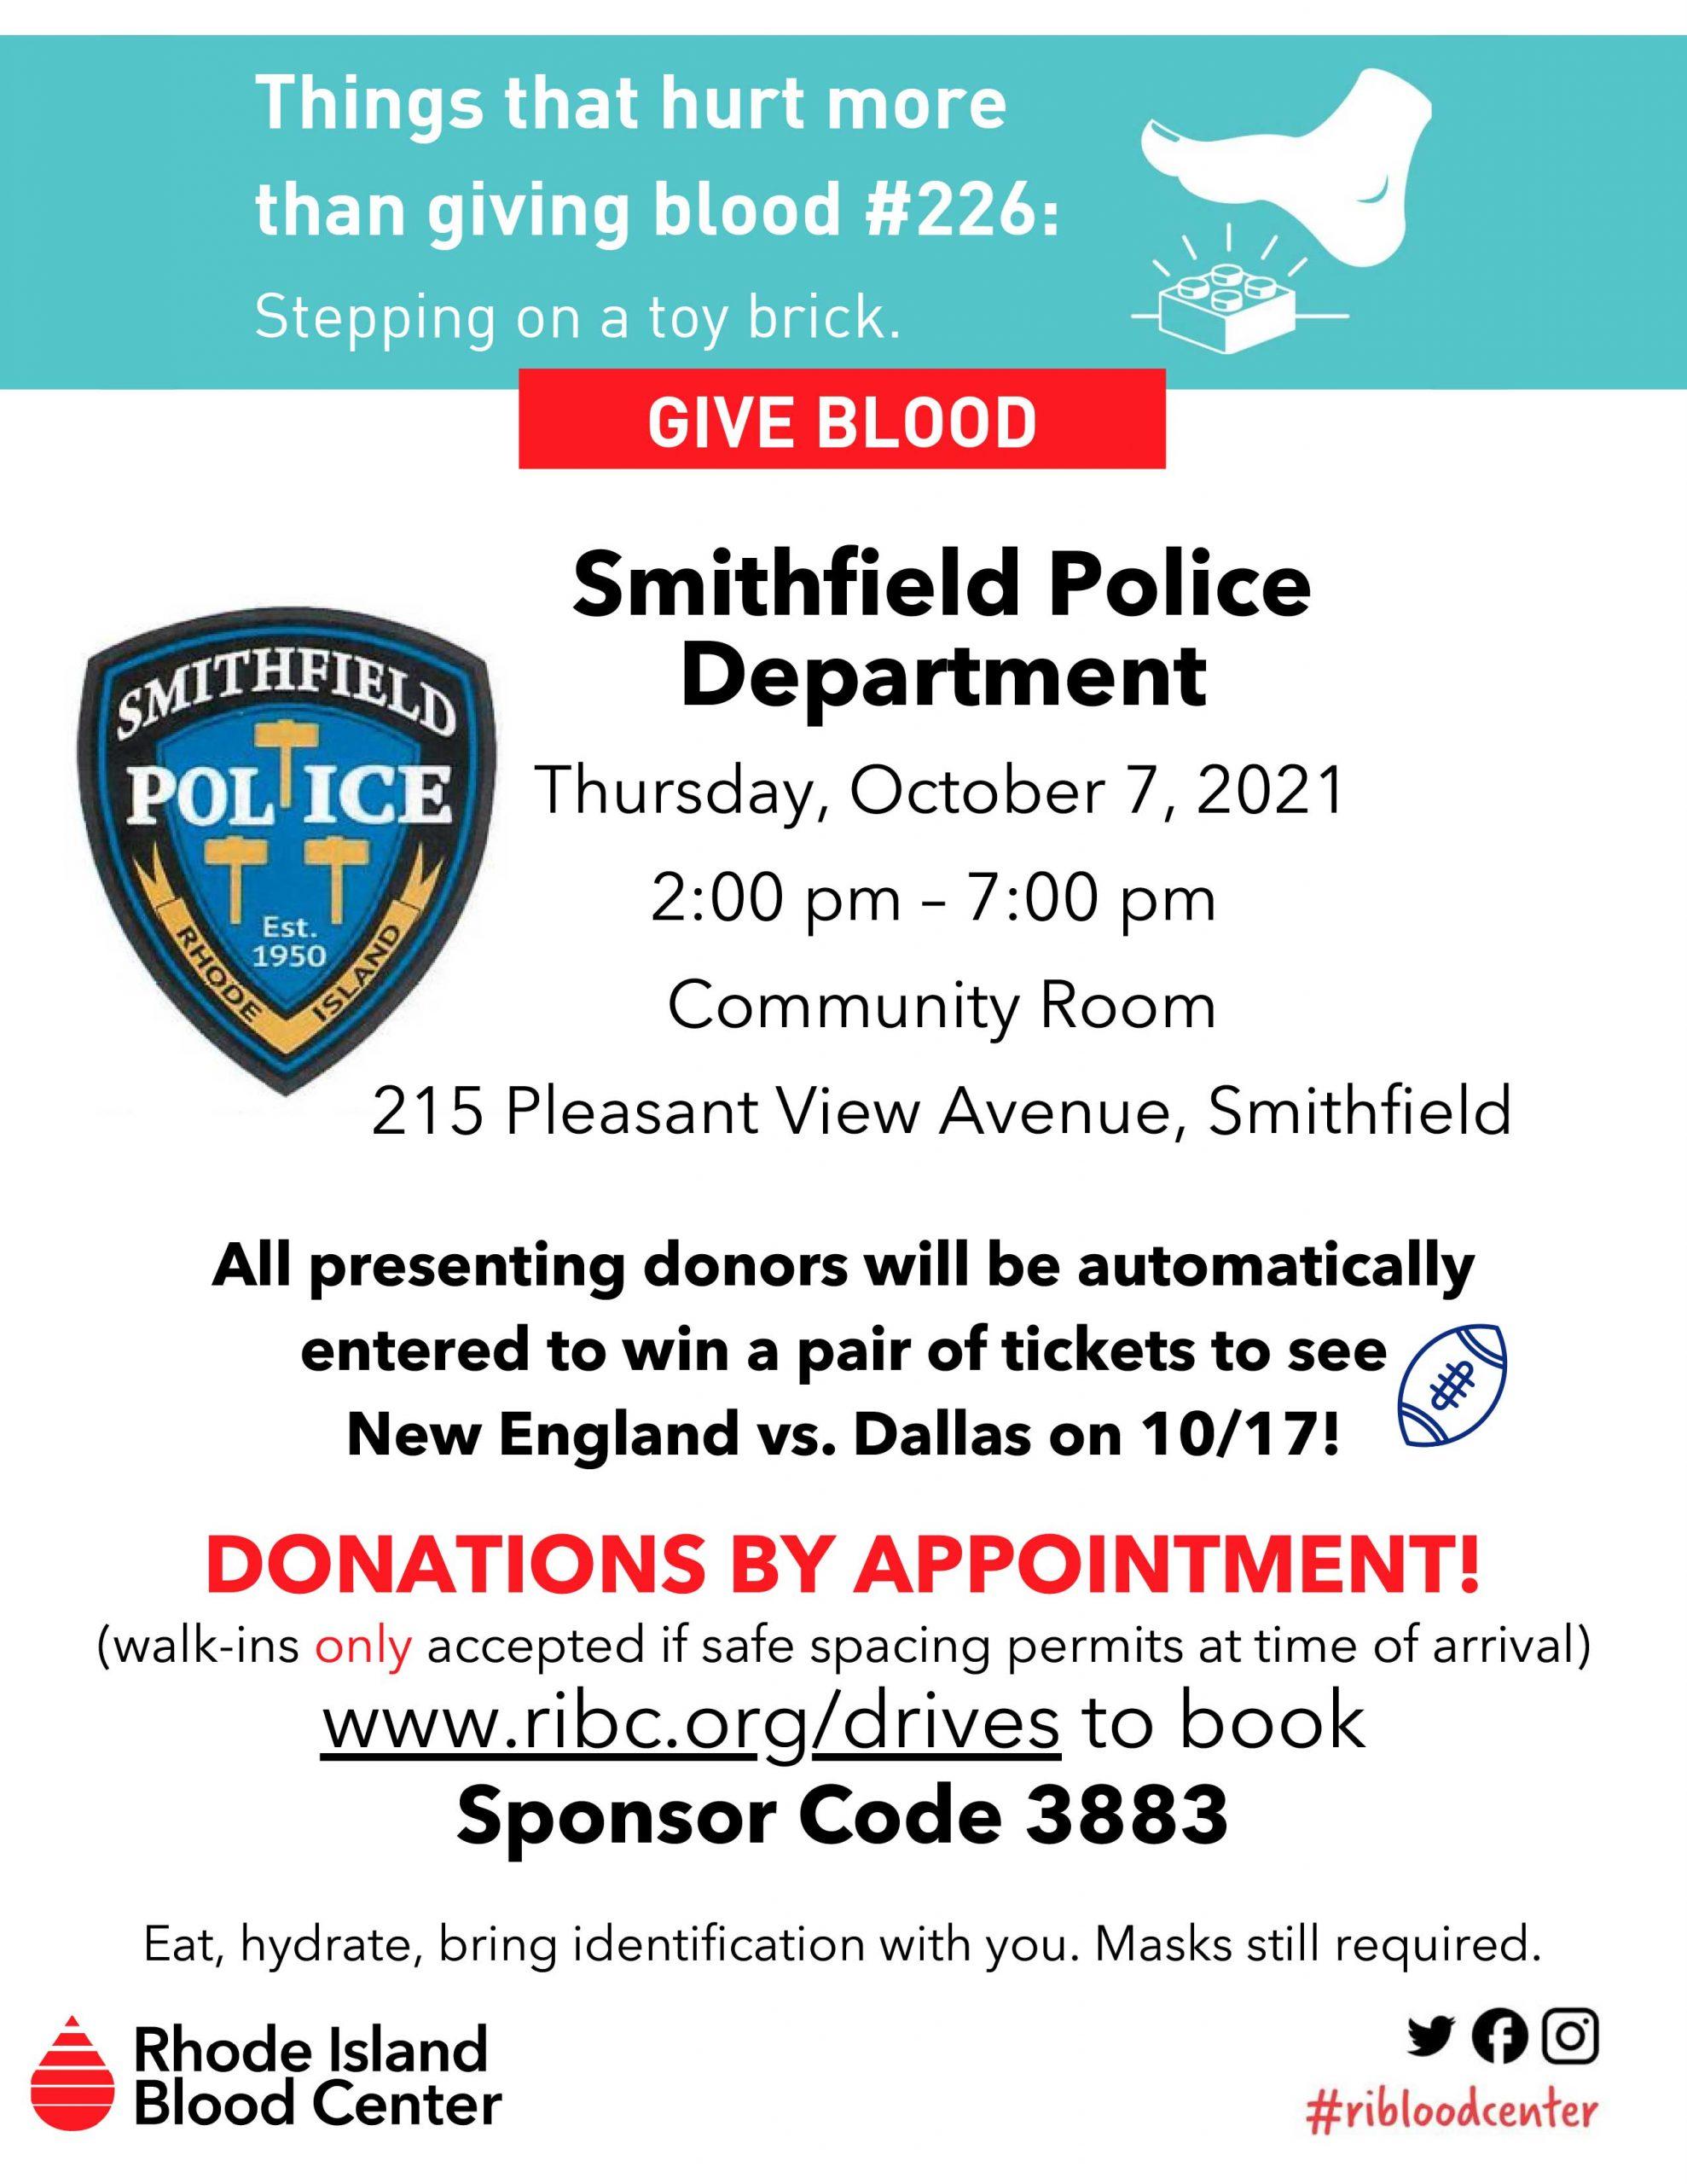 SPD Blood Drive - Thursday, October 7, 2021